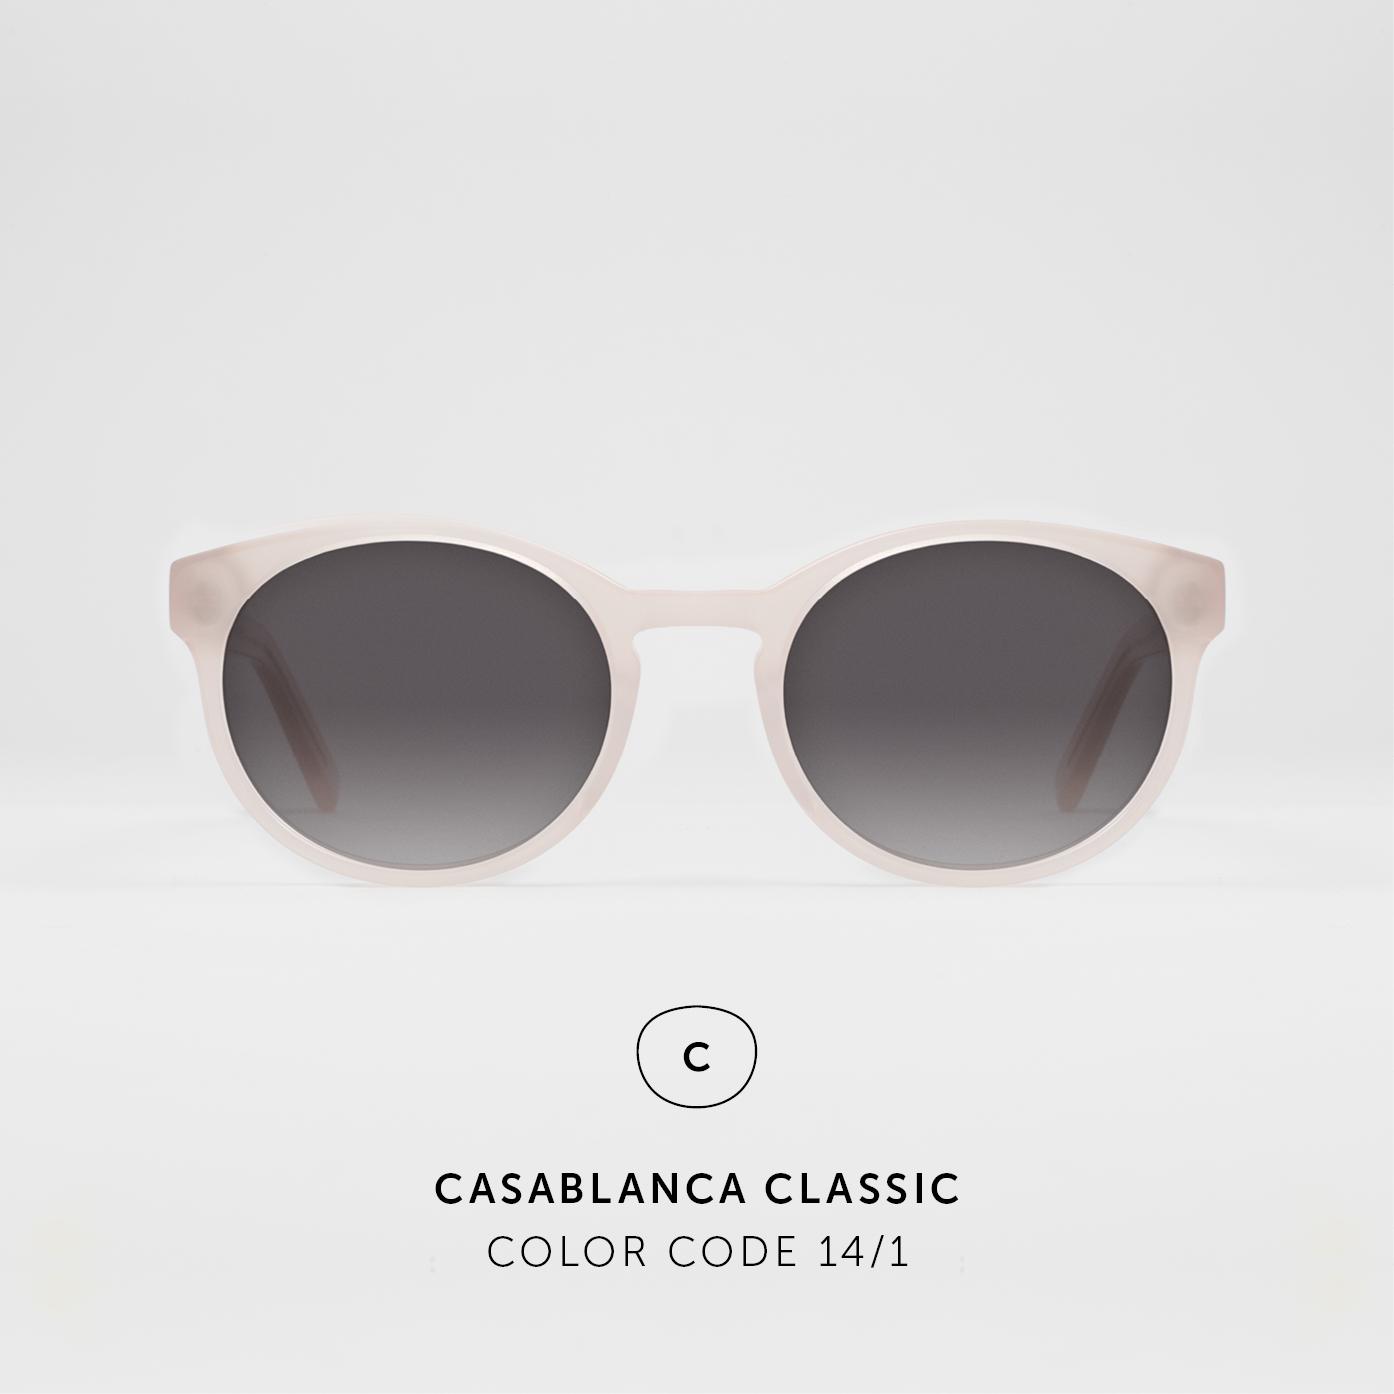 CasablancaClassic64.jpg